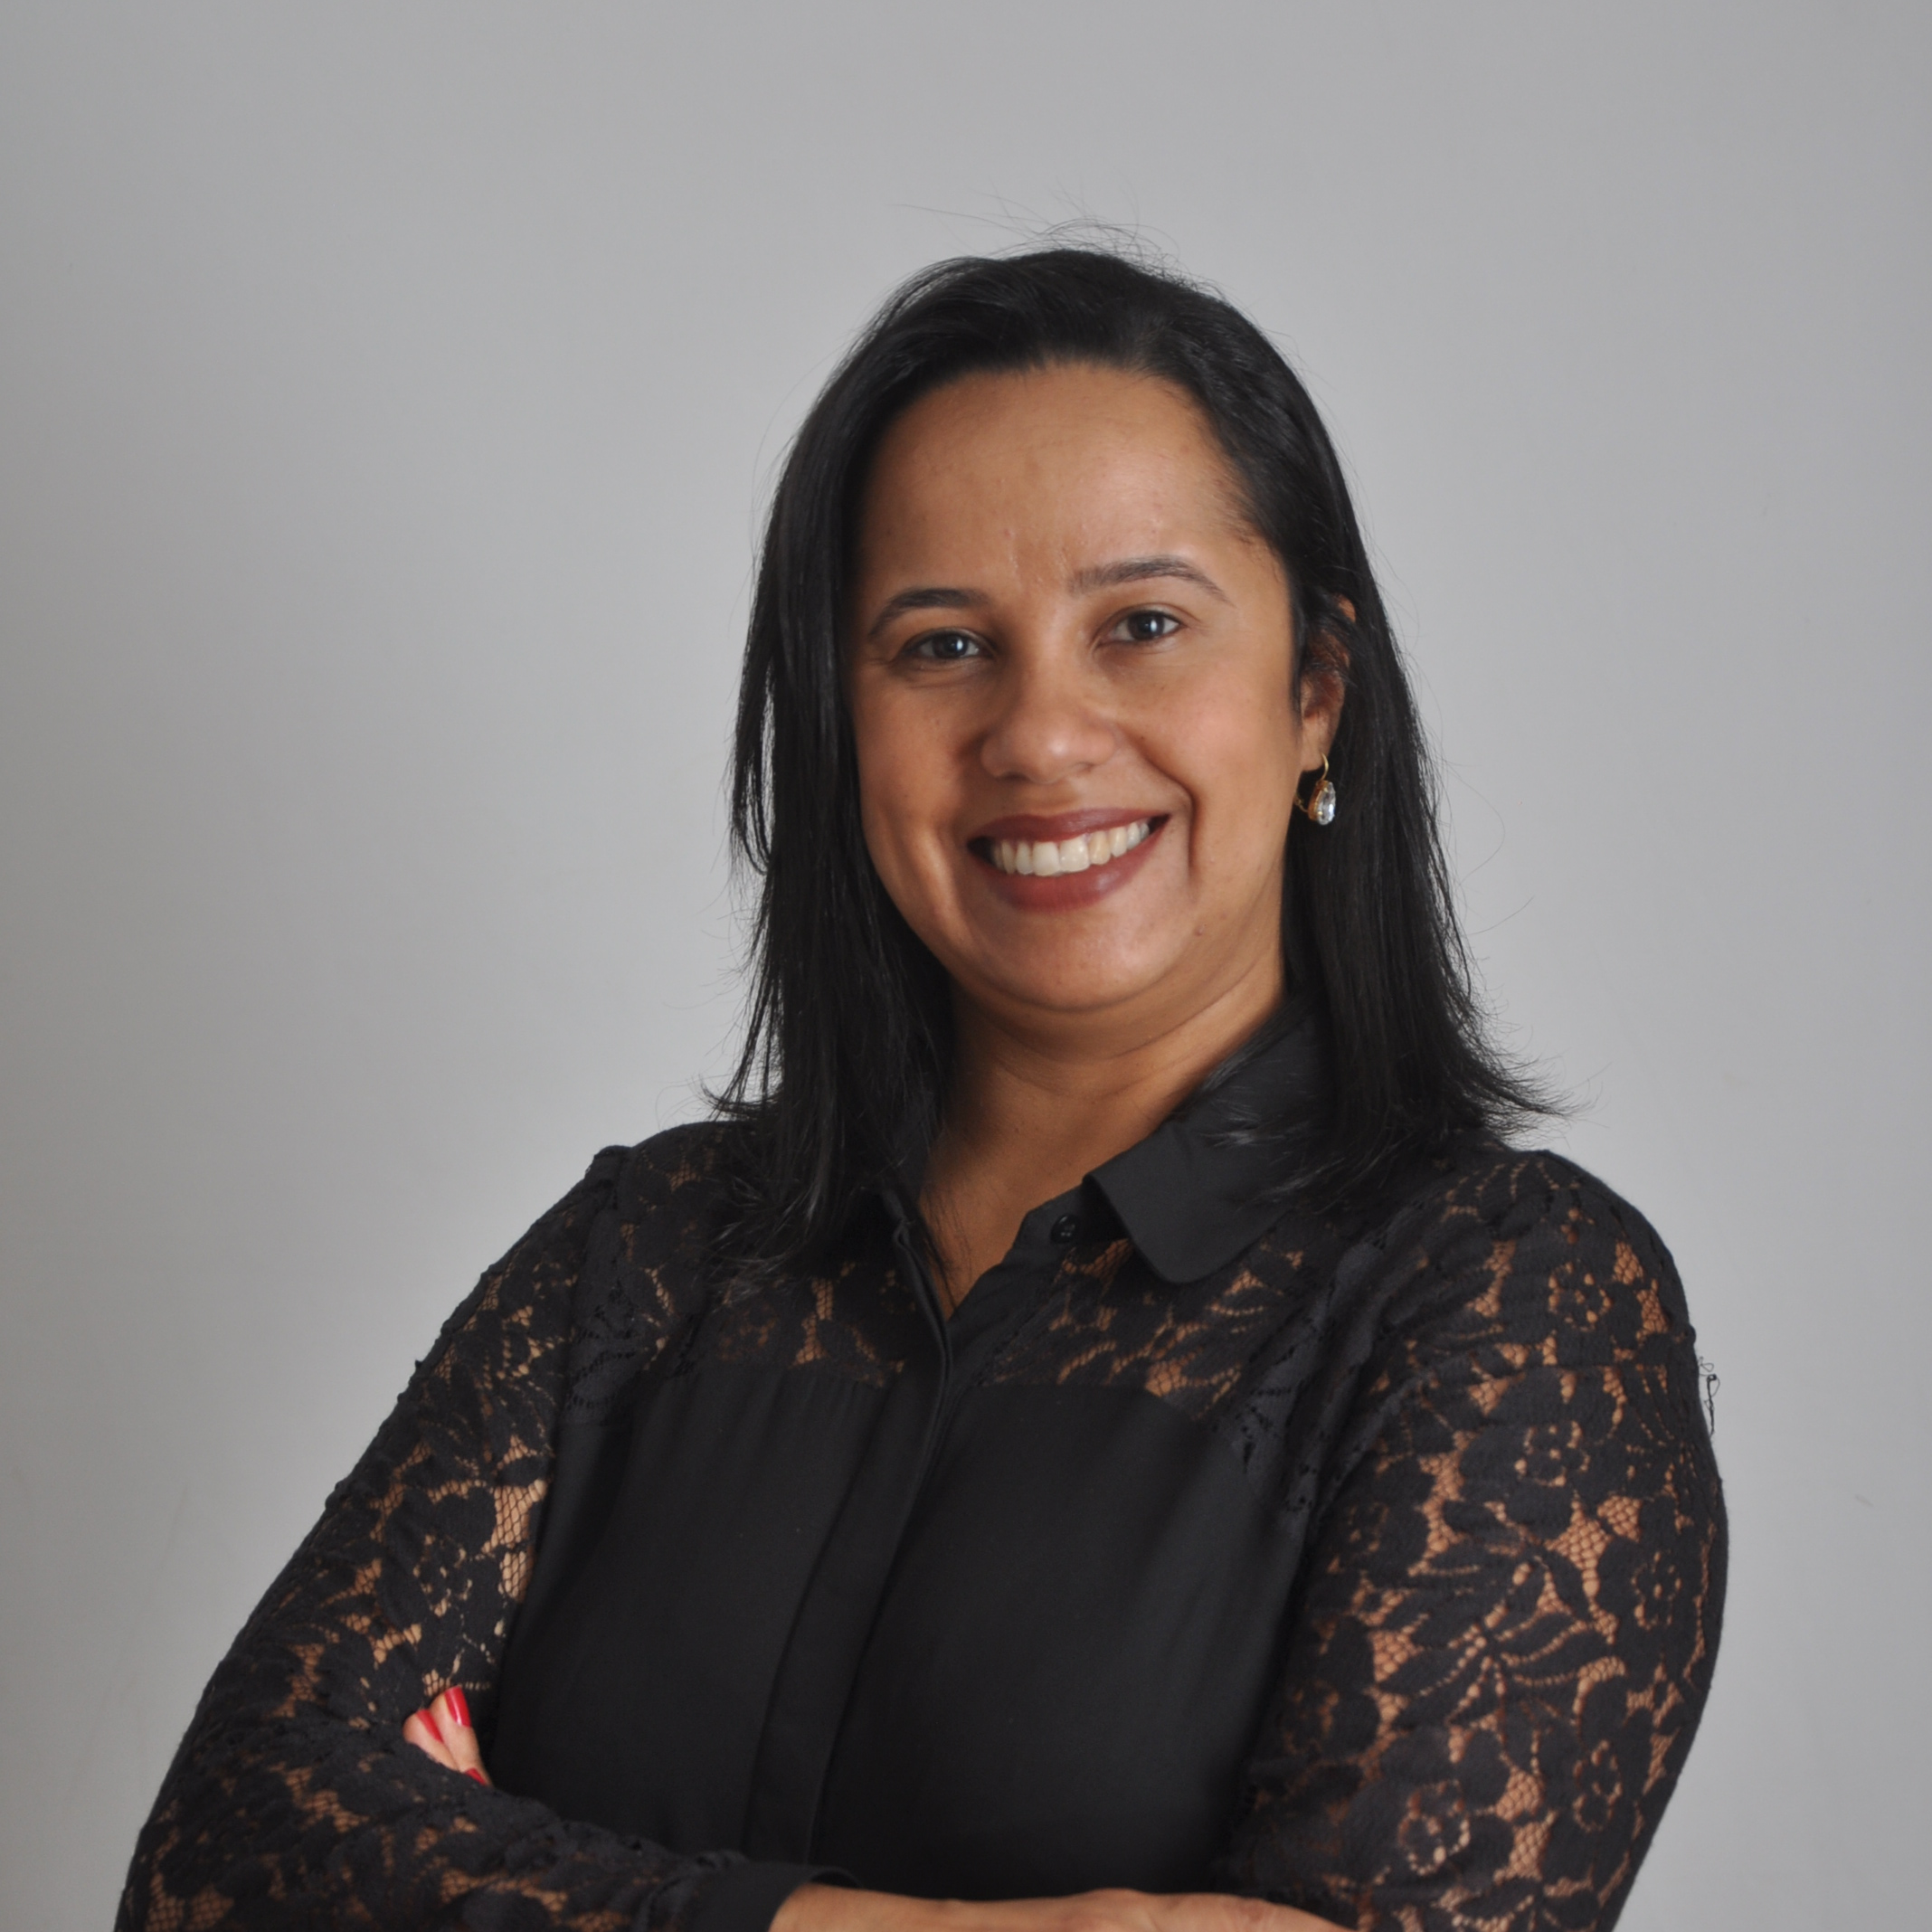 Alexandra Maria Martins Jeronymo